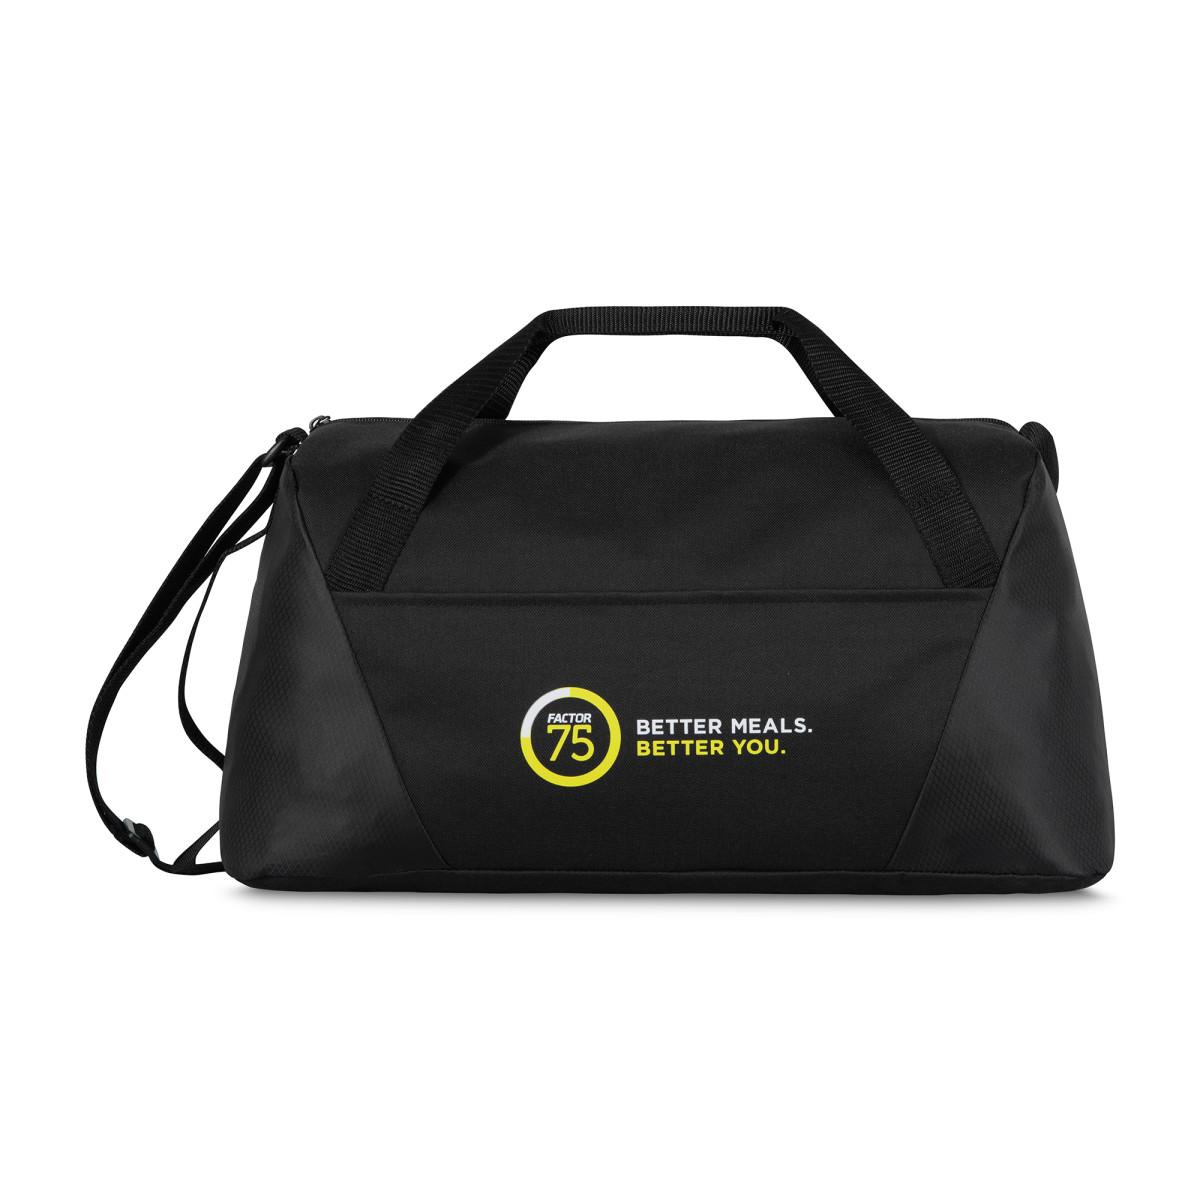 Gemline 100069 - Geometric Sport Bag